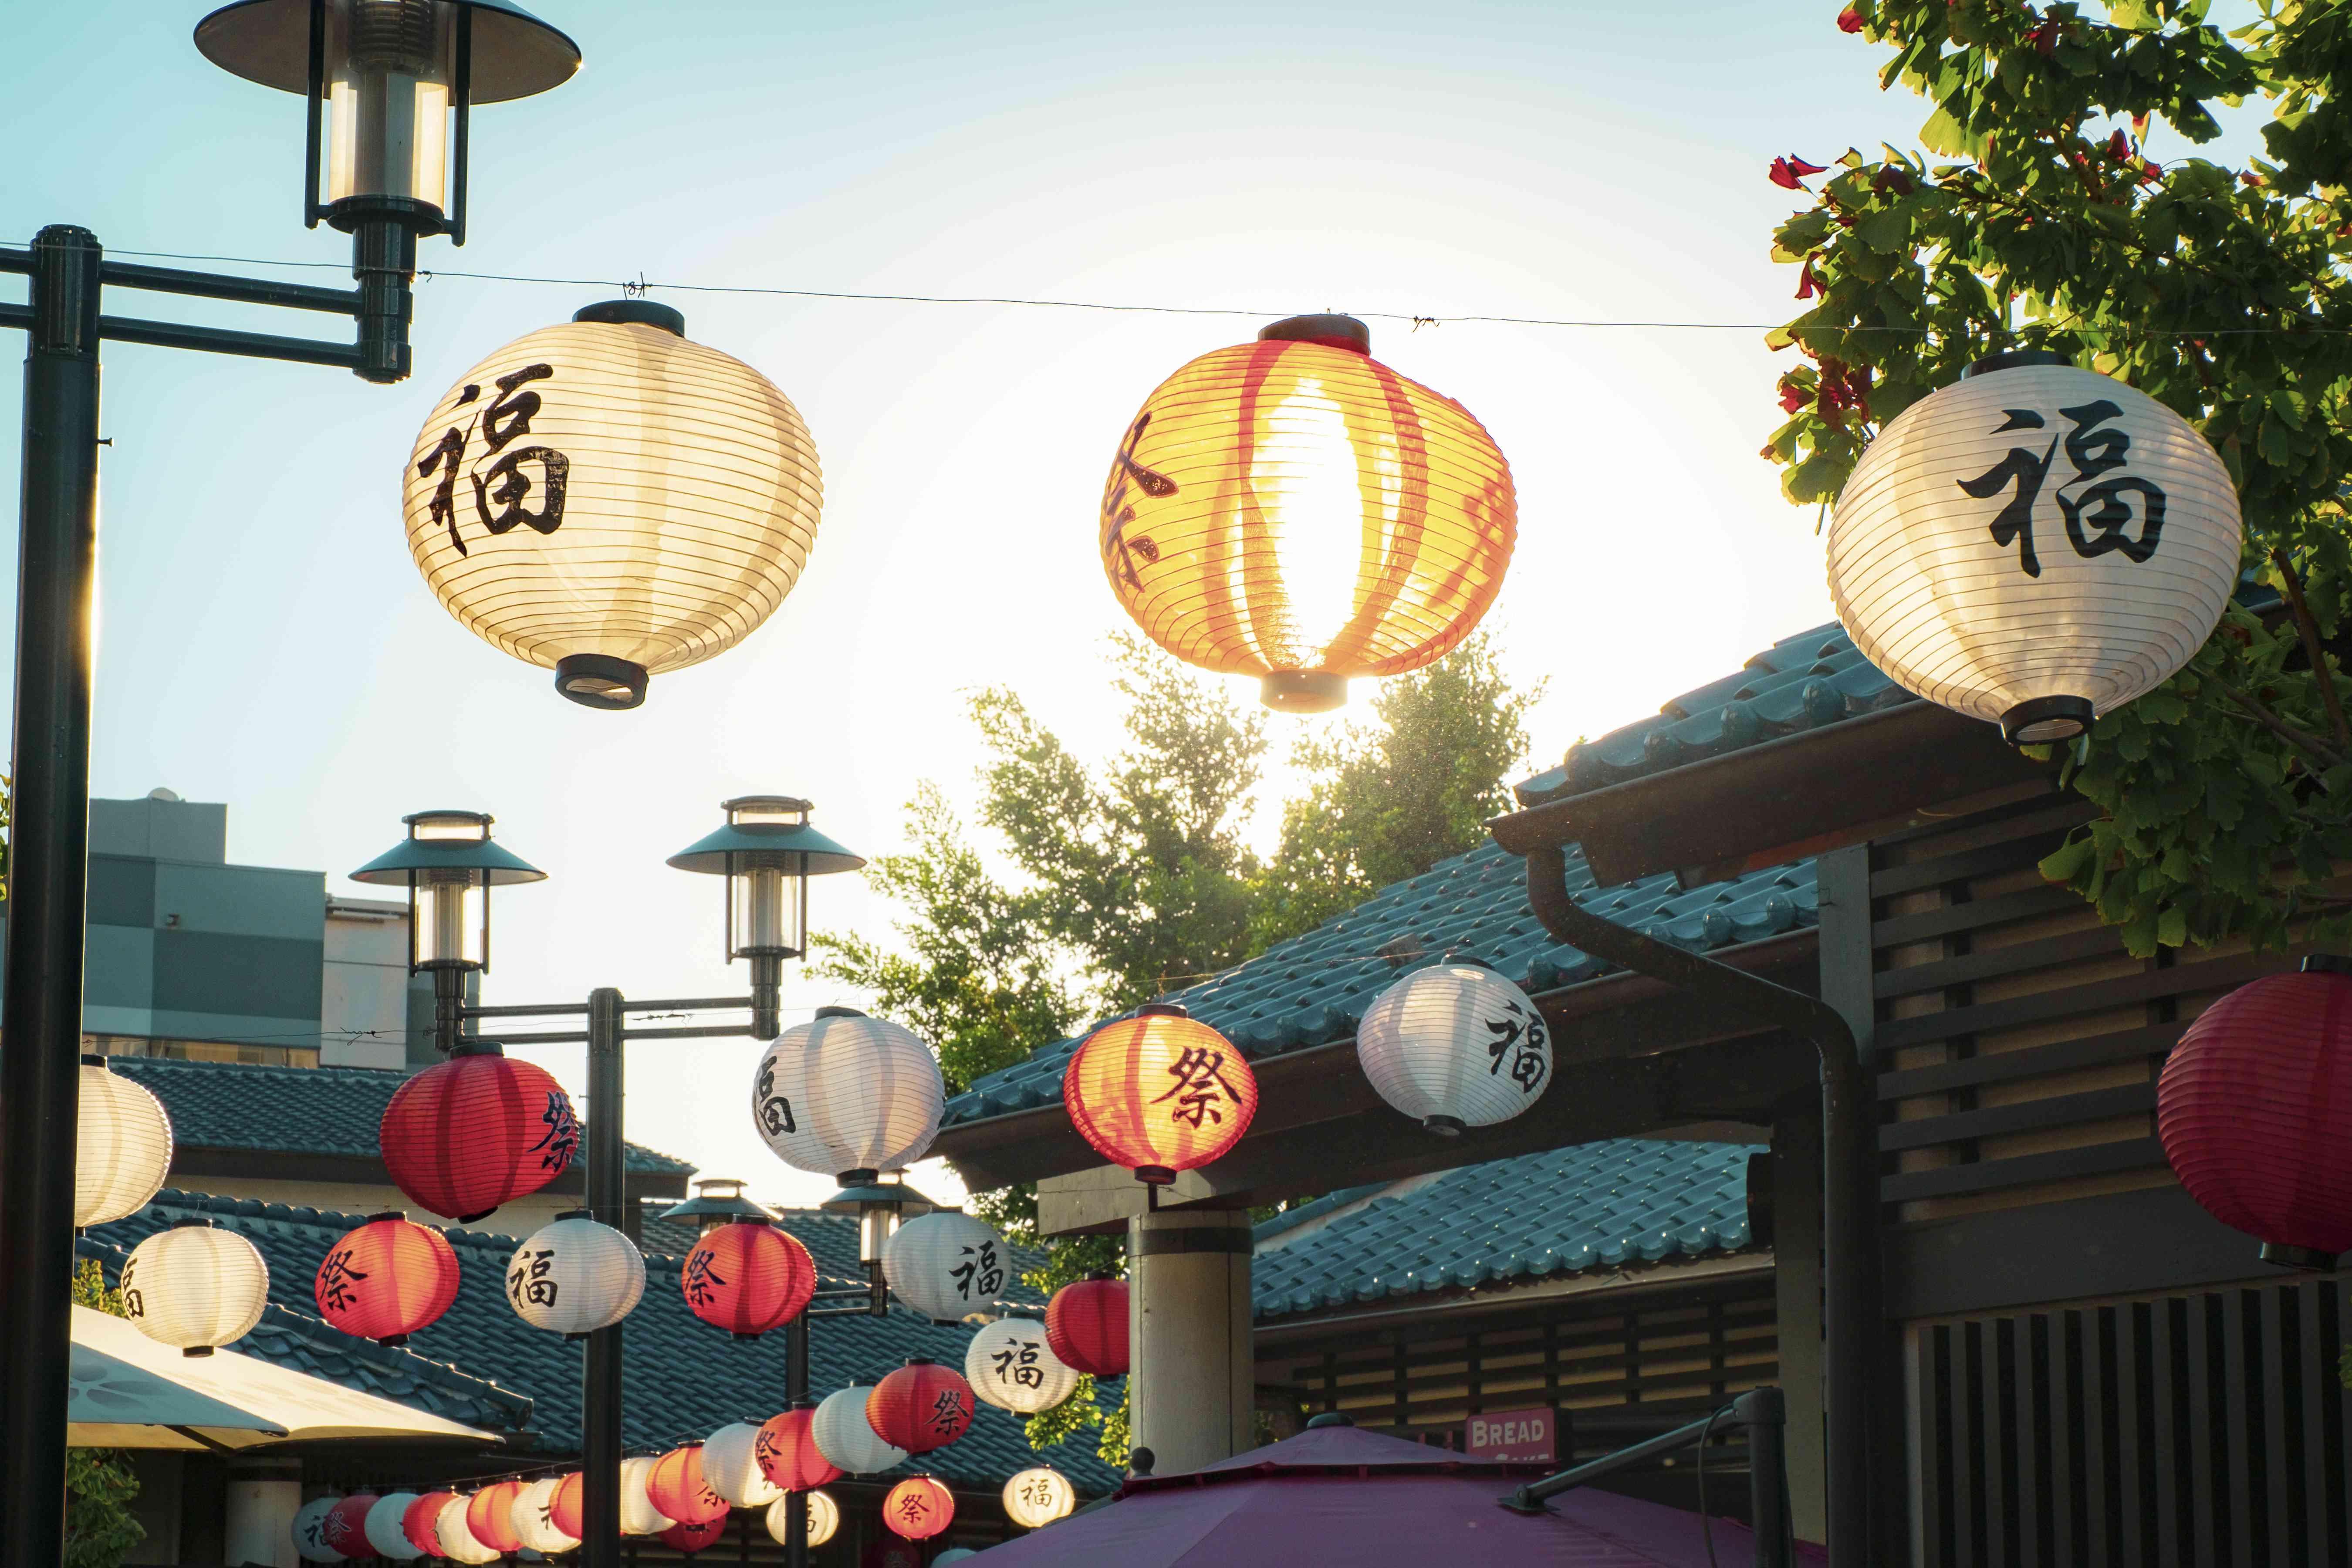 Japanese lanterns in Little Tokyo in Los Angeles